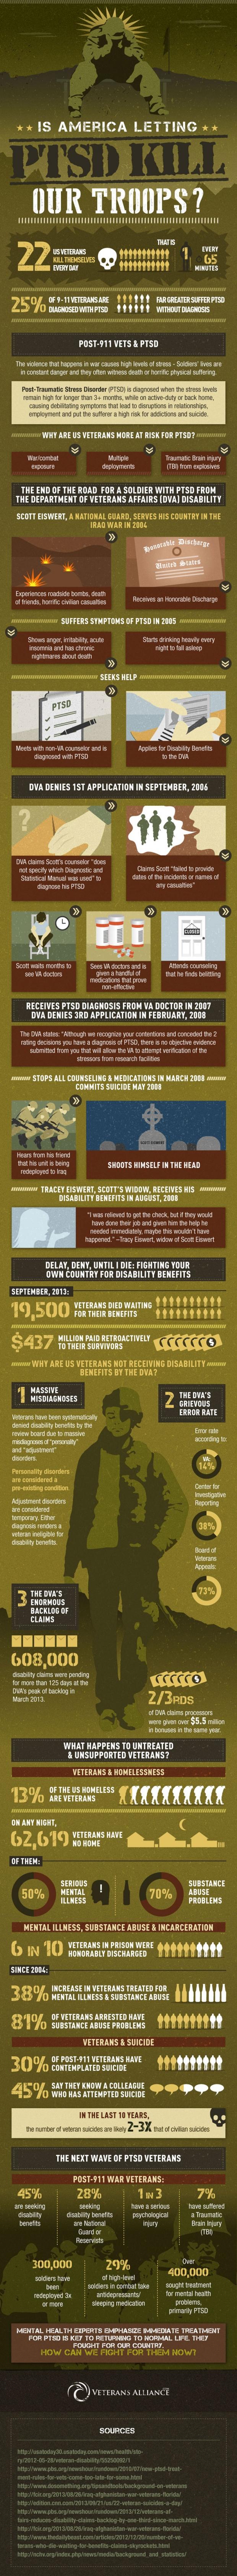 PTSD-Infographic